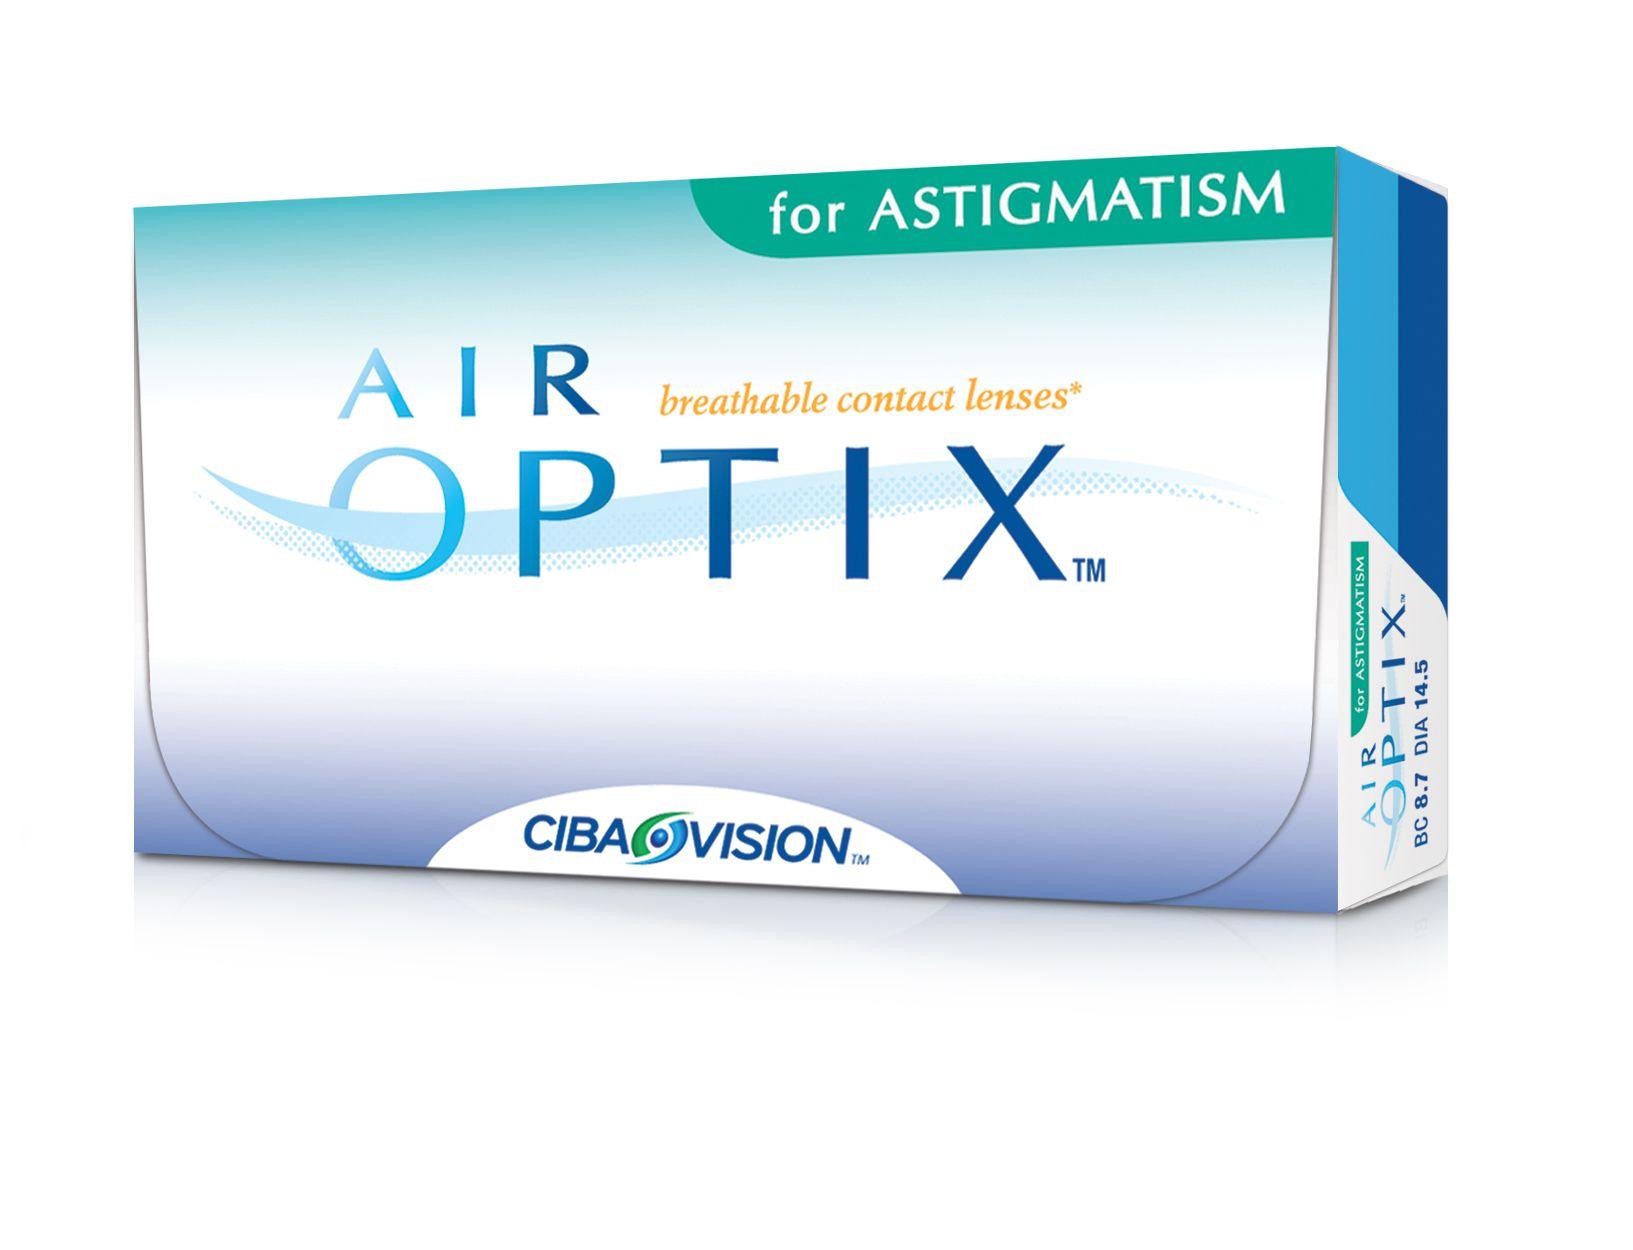 Air Optix For Astigmatism Contact Lenses Air Optix Astigmatism